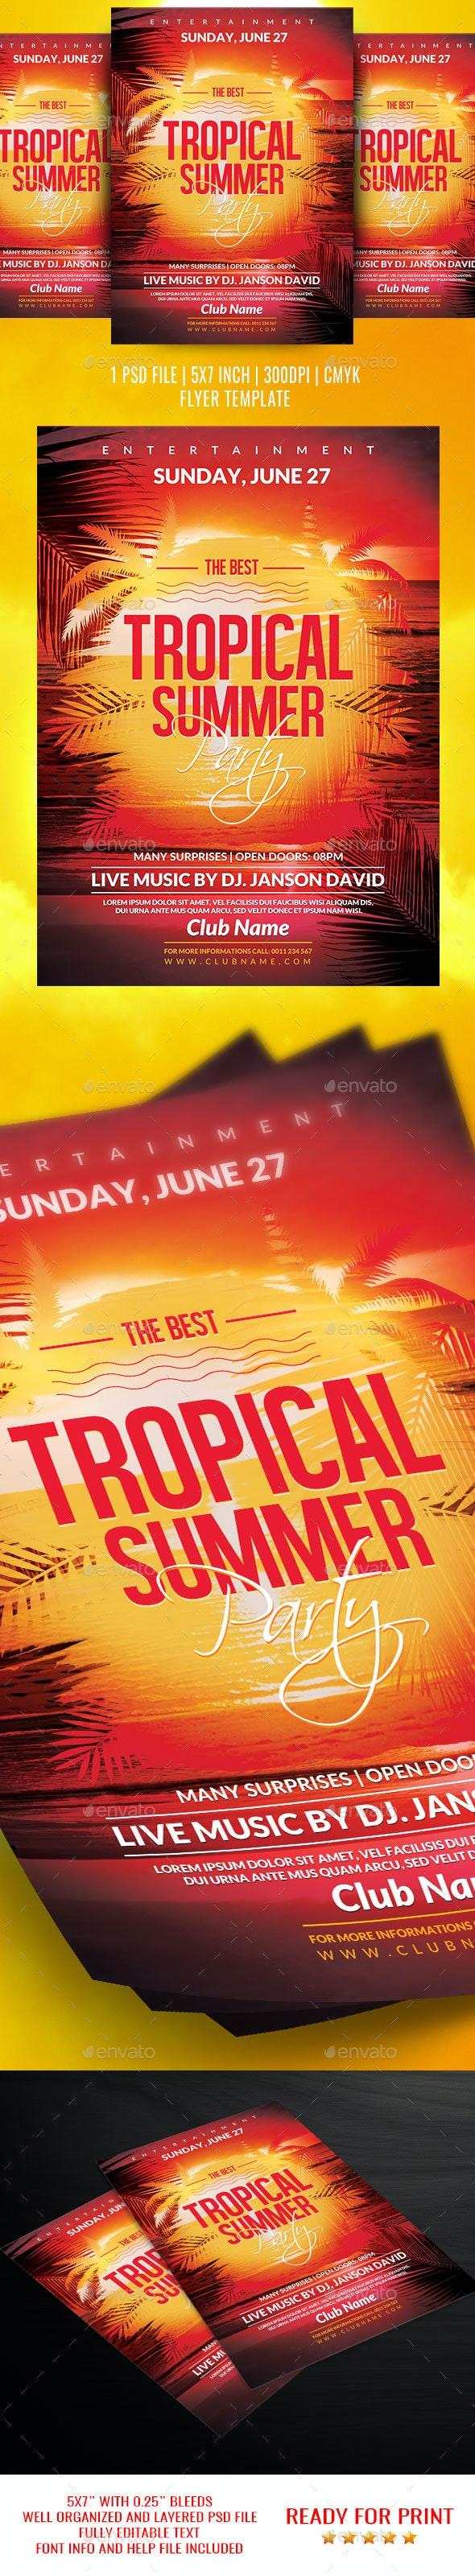 Tropical Summer Flyer Template - Flyers Print Templates